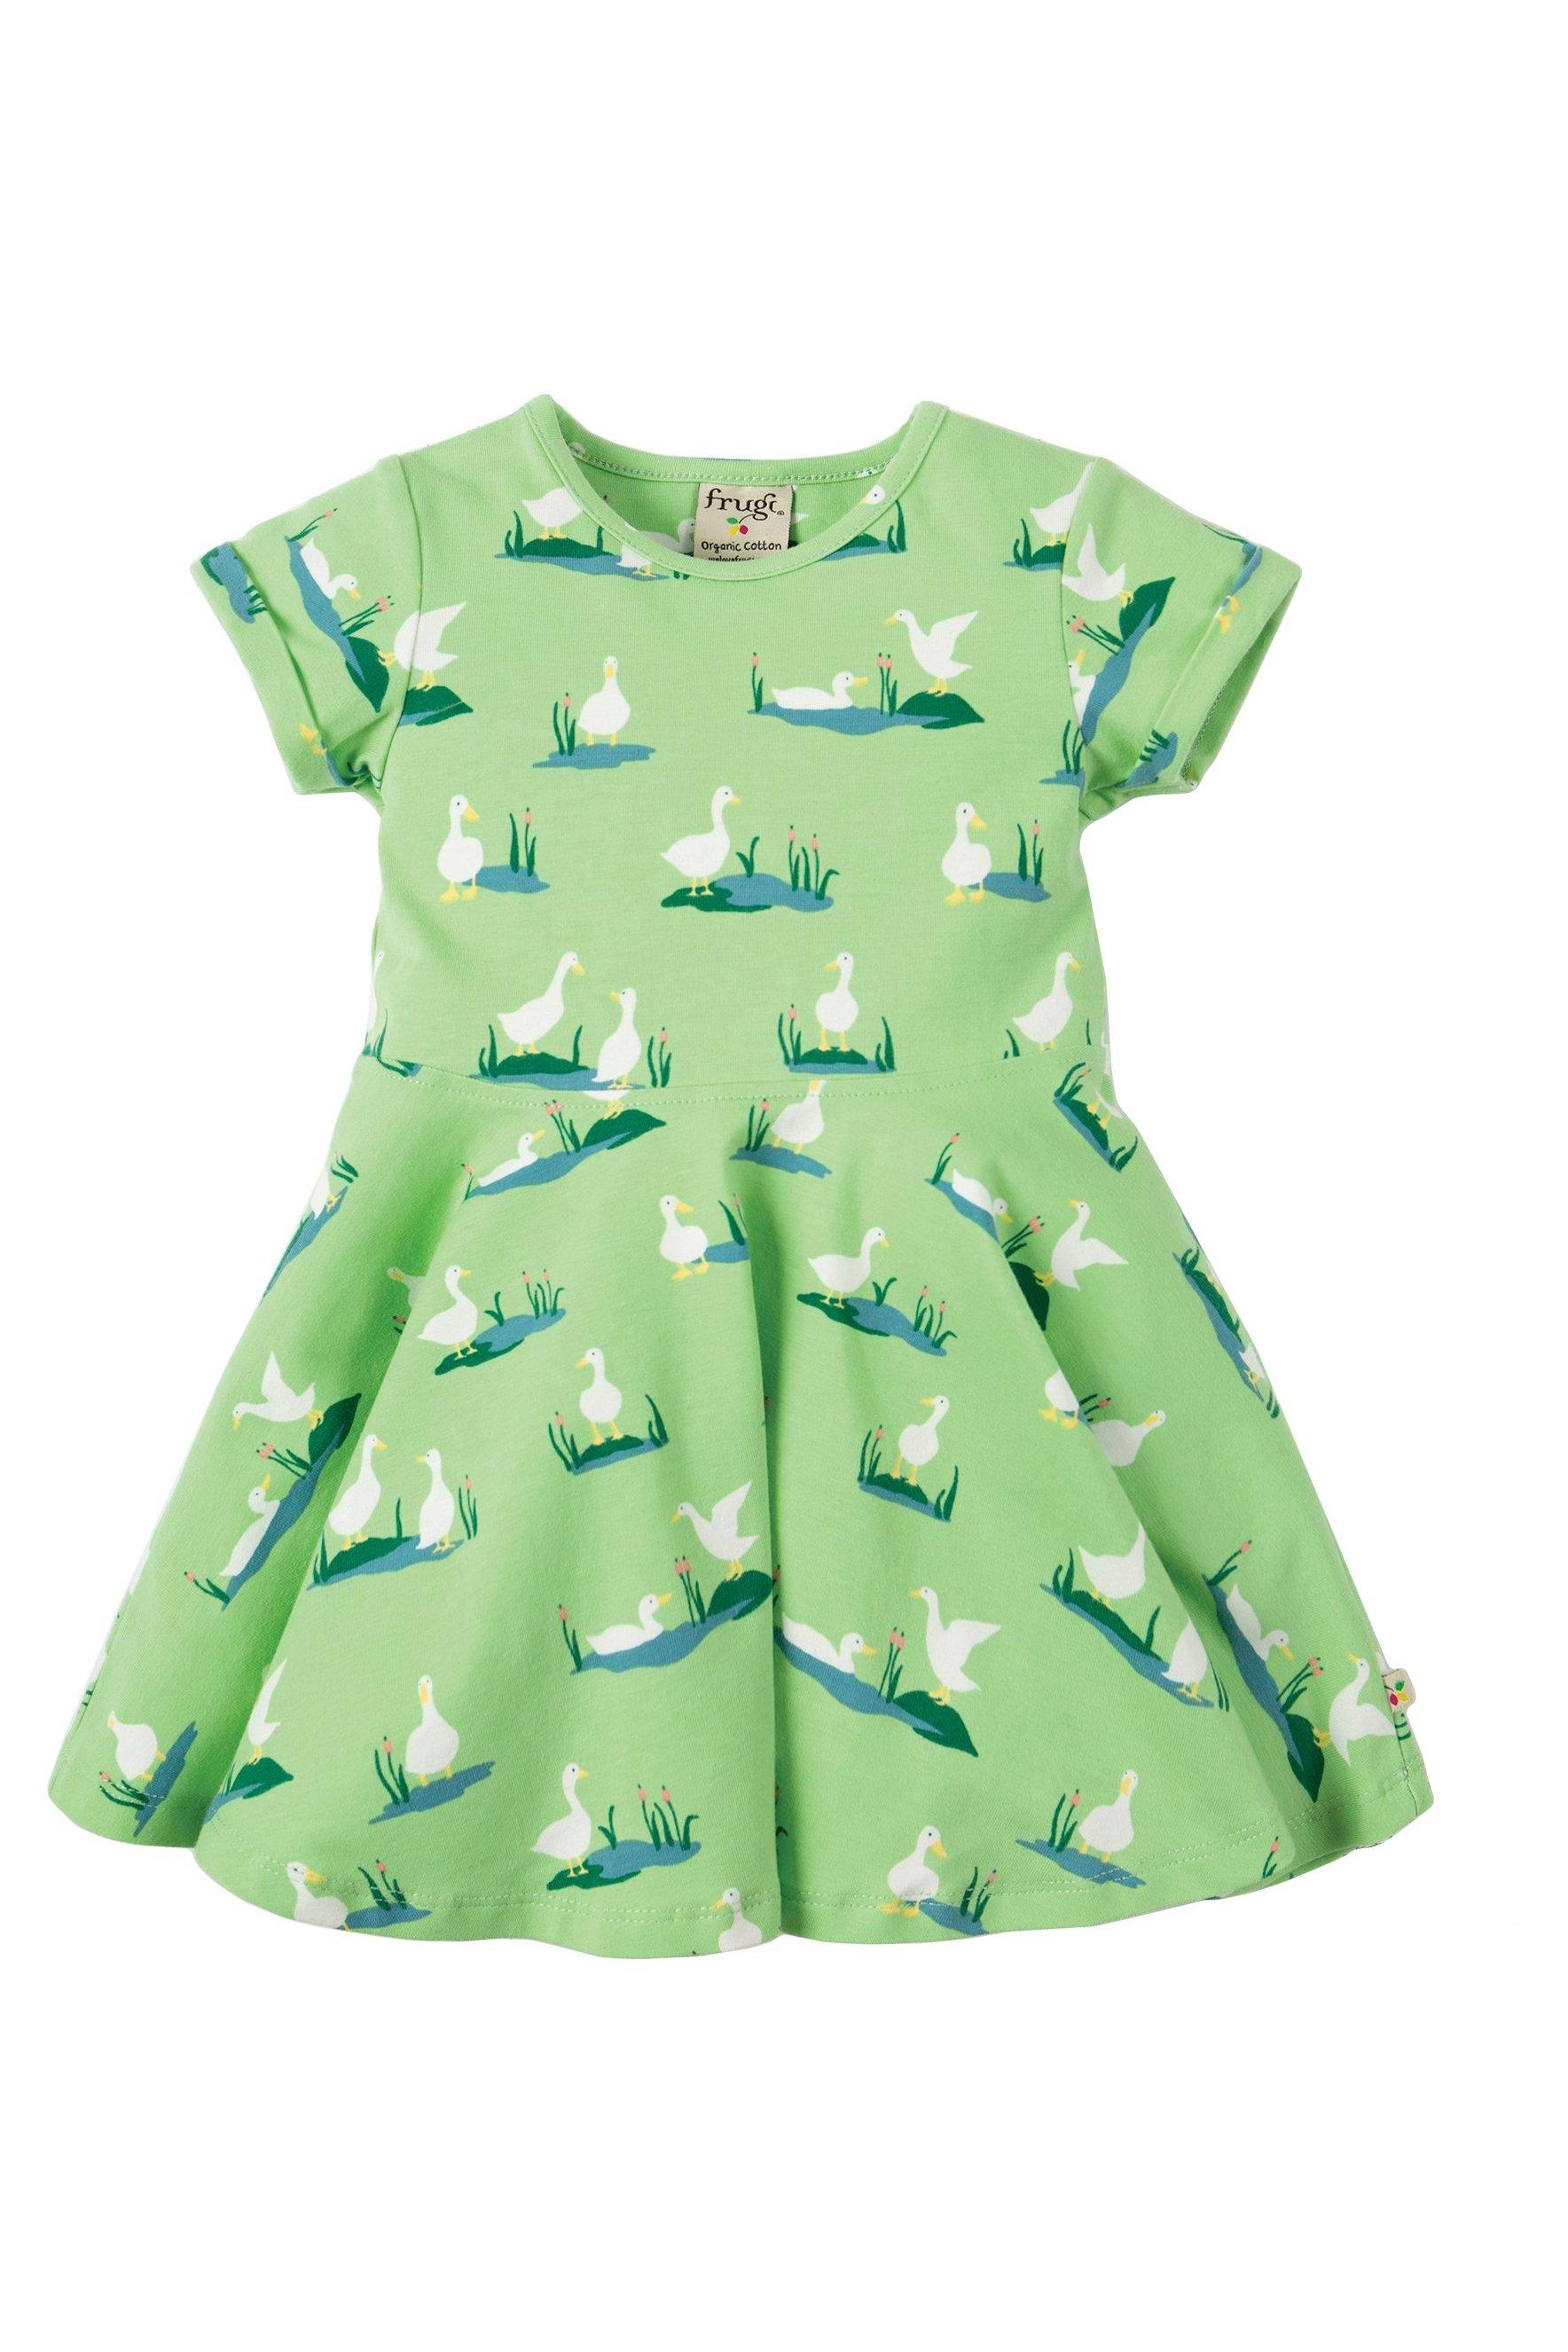 7e7fe32c9e9e Snurrklänning barn kortärm grön ankdamm, 1-4 år